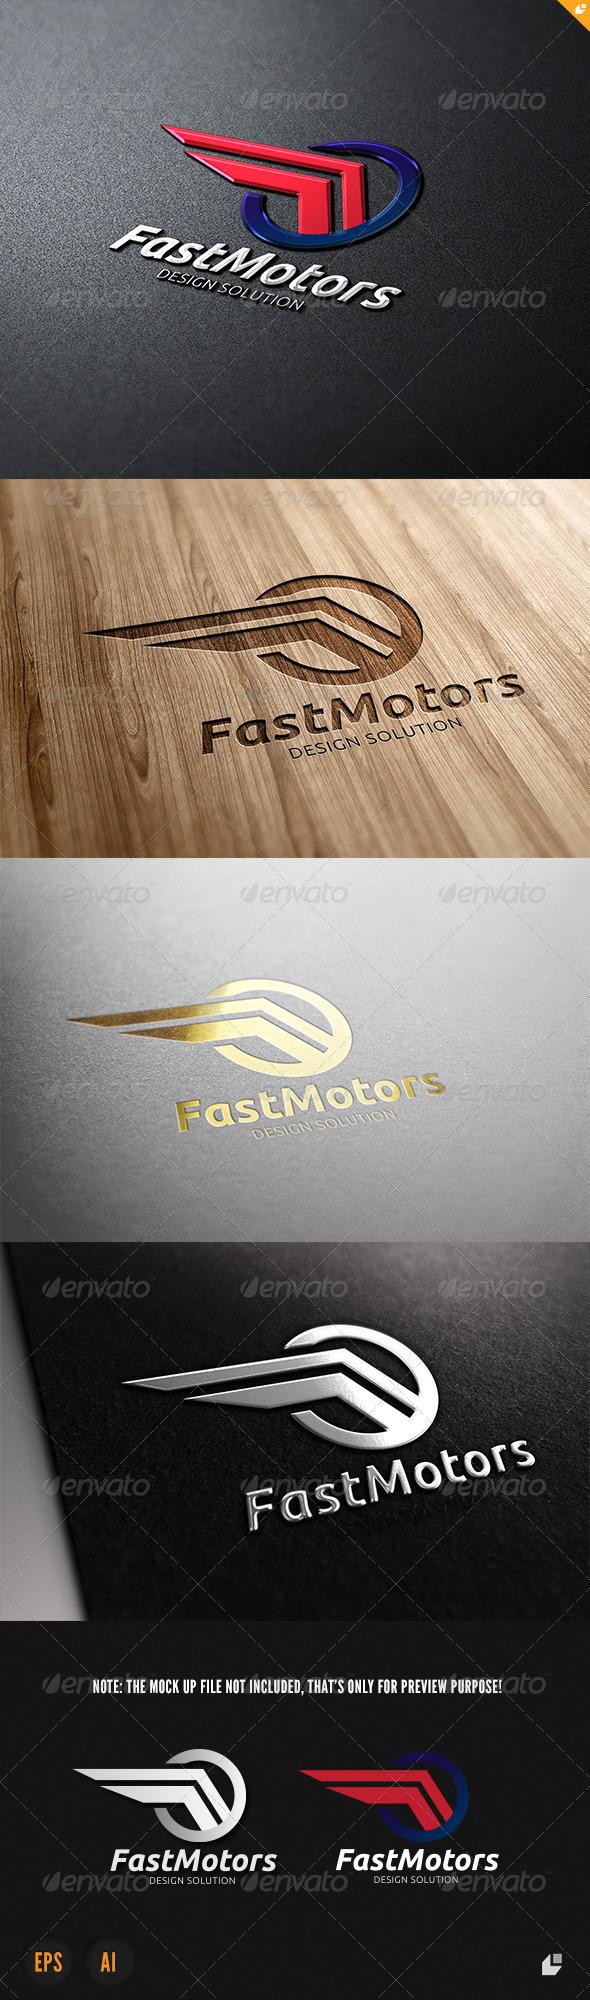 Fast Motors Logo - Vector Abstract